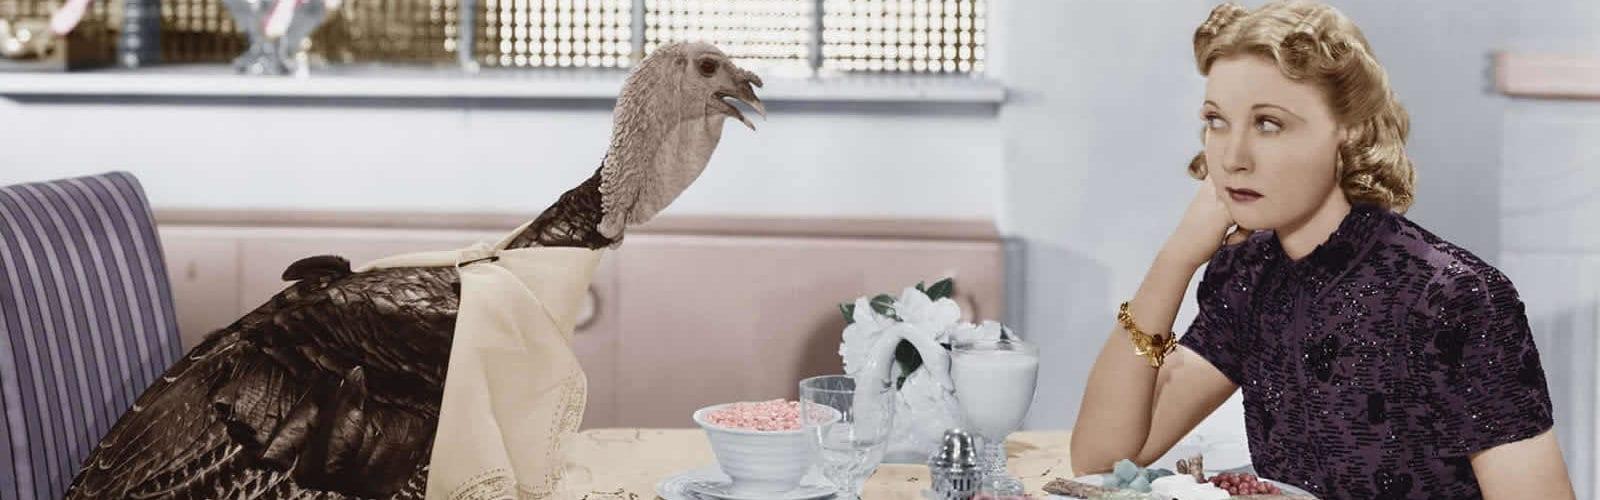 feter-thanksgiving-etats-unis-tradition-dinde-farcie-une3